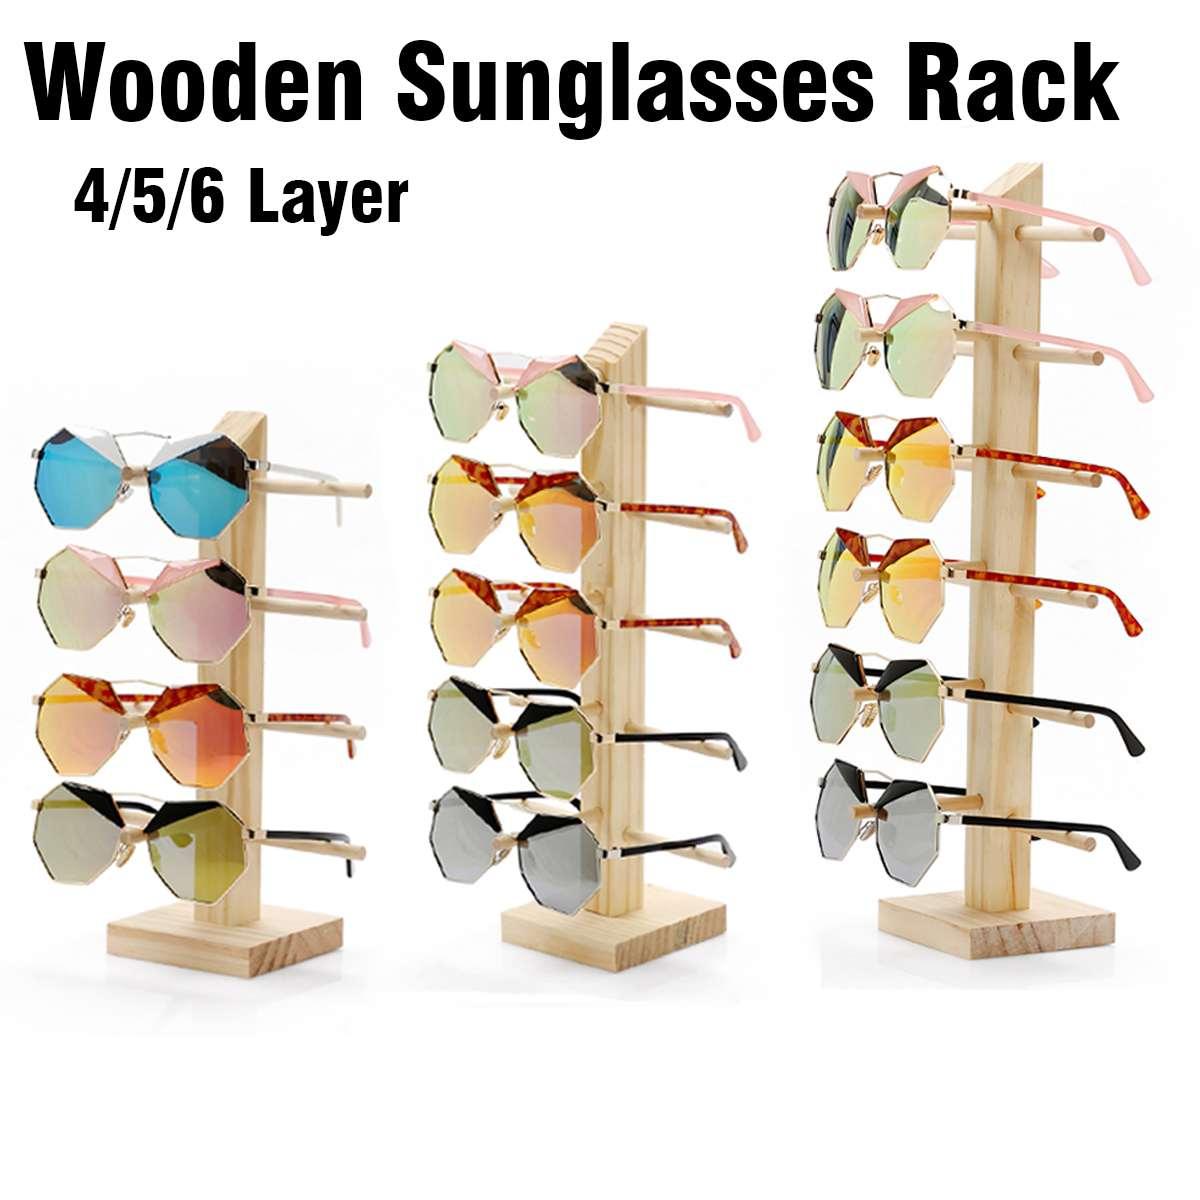 4/5/6 Layers Multi Layers Wood Sunglass Display Rack Shelf Eyeglasses Show Stand Jewelry Holder for Multi Pairs Glasses Showcase